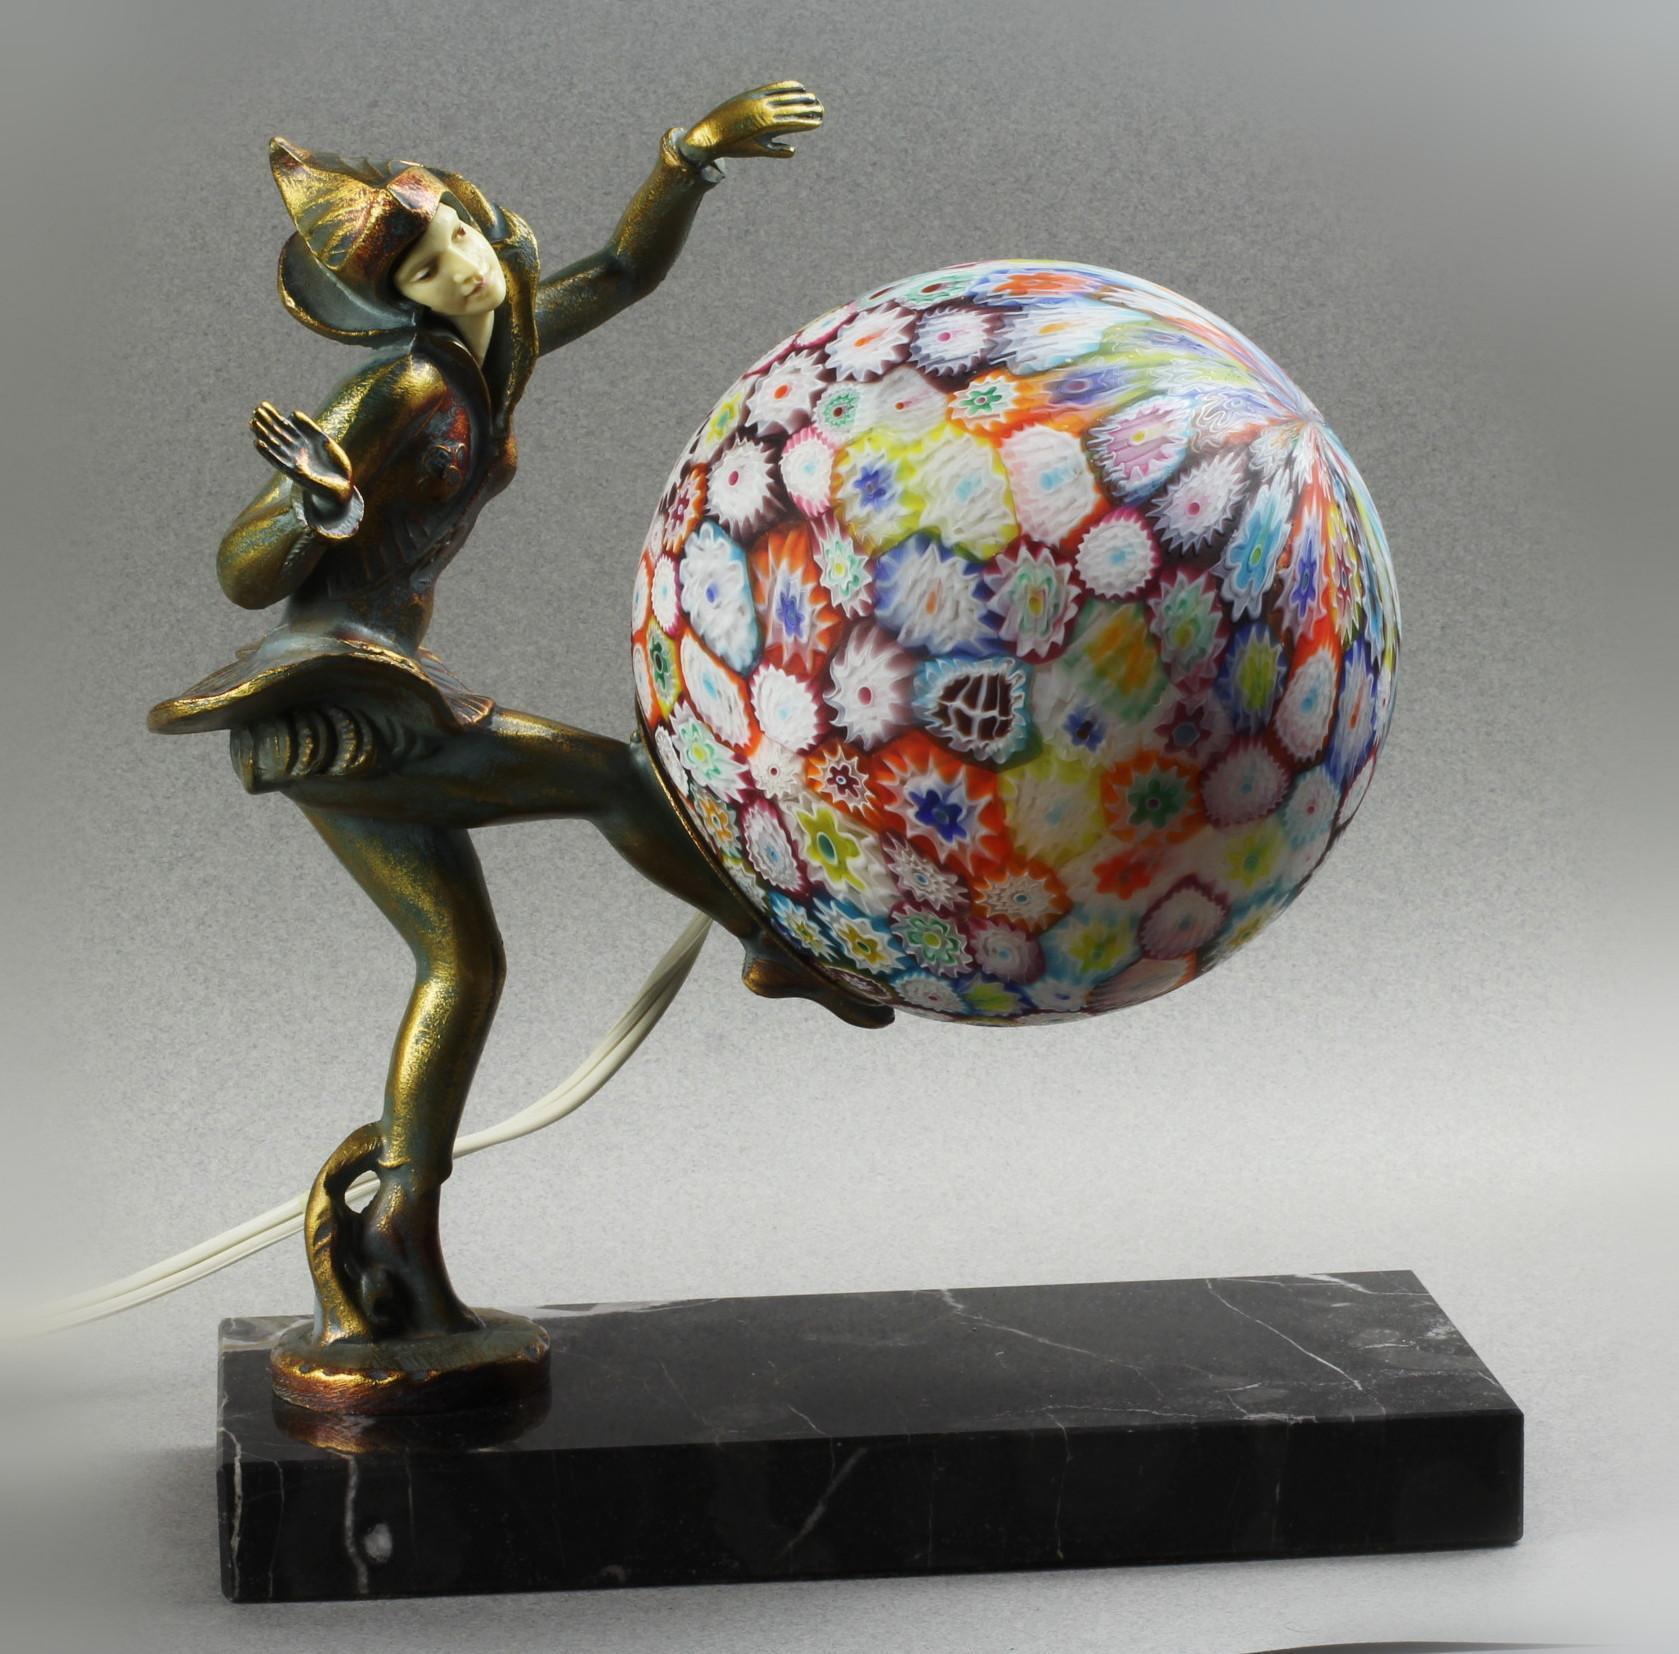 Art Deco Gerdago Harlequin Pixie Lamp with Millefiore Shade, Marble Base